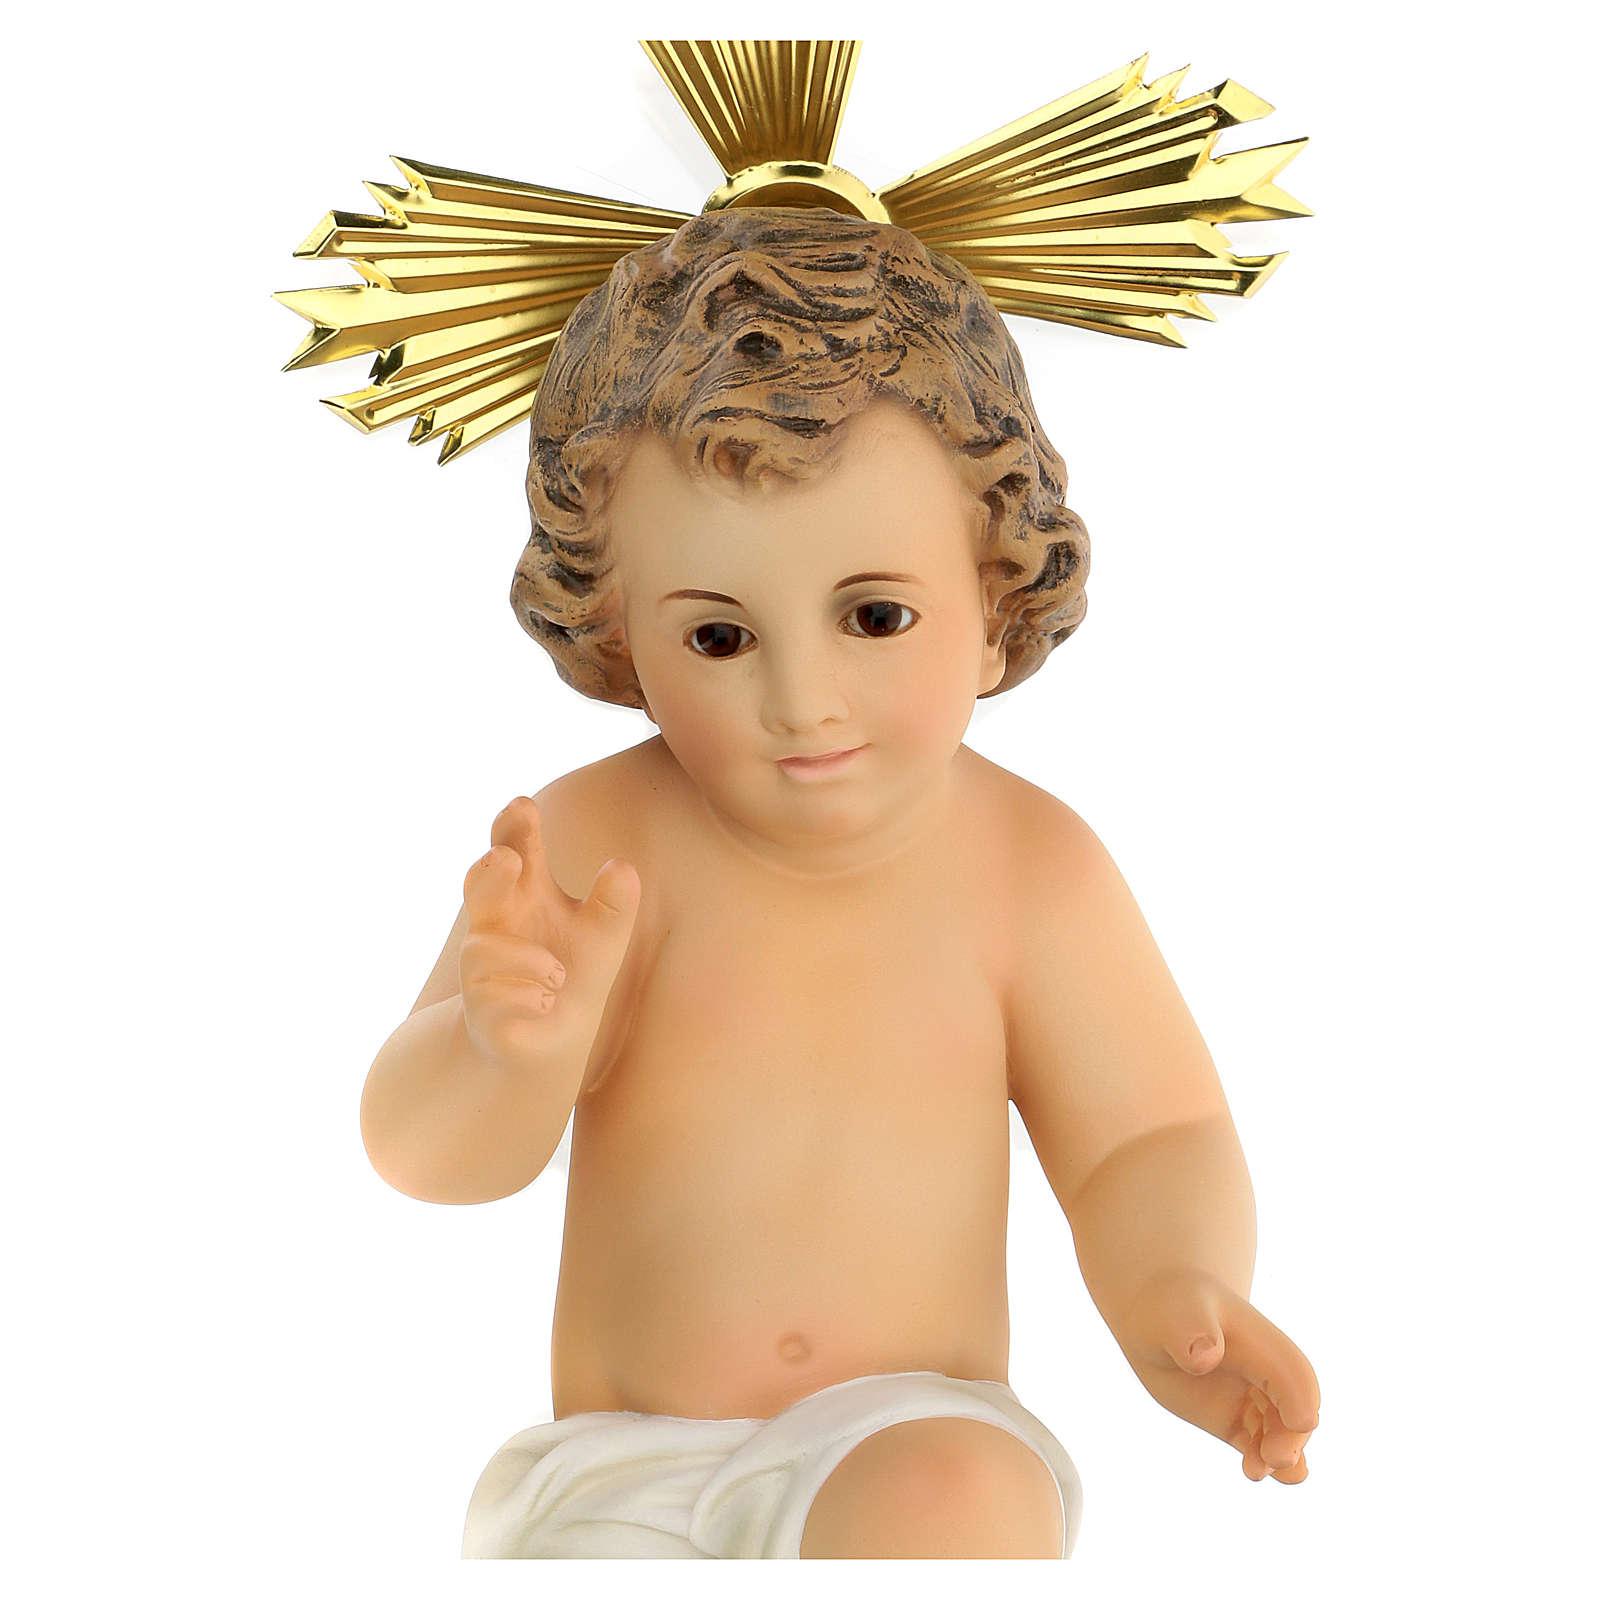 Niño Jesús estatua pulpa madera vestido crema 30 cm dec. elegante 3